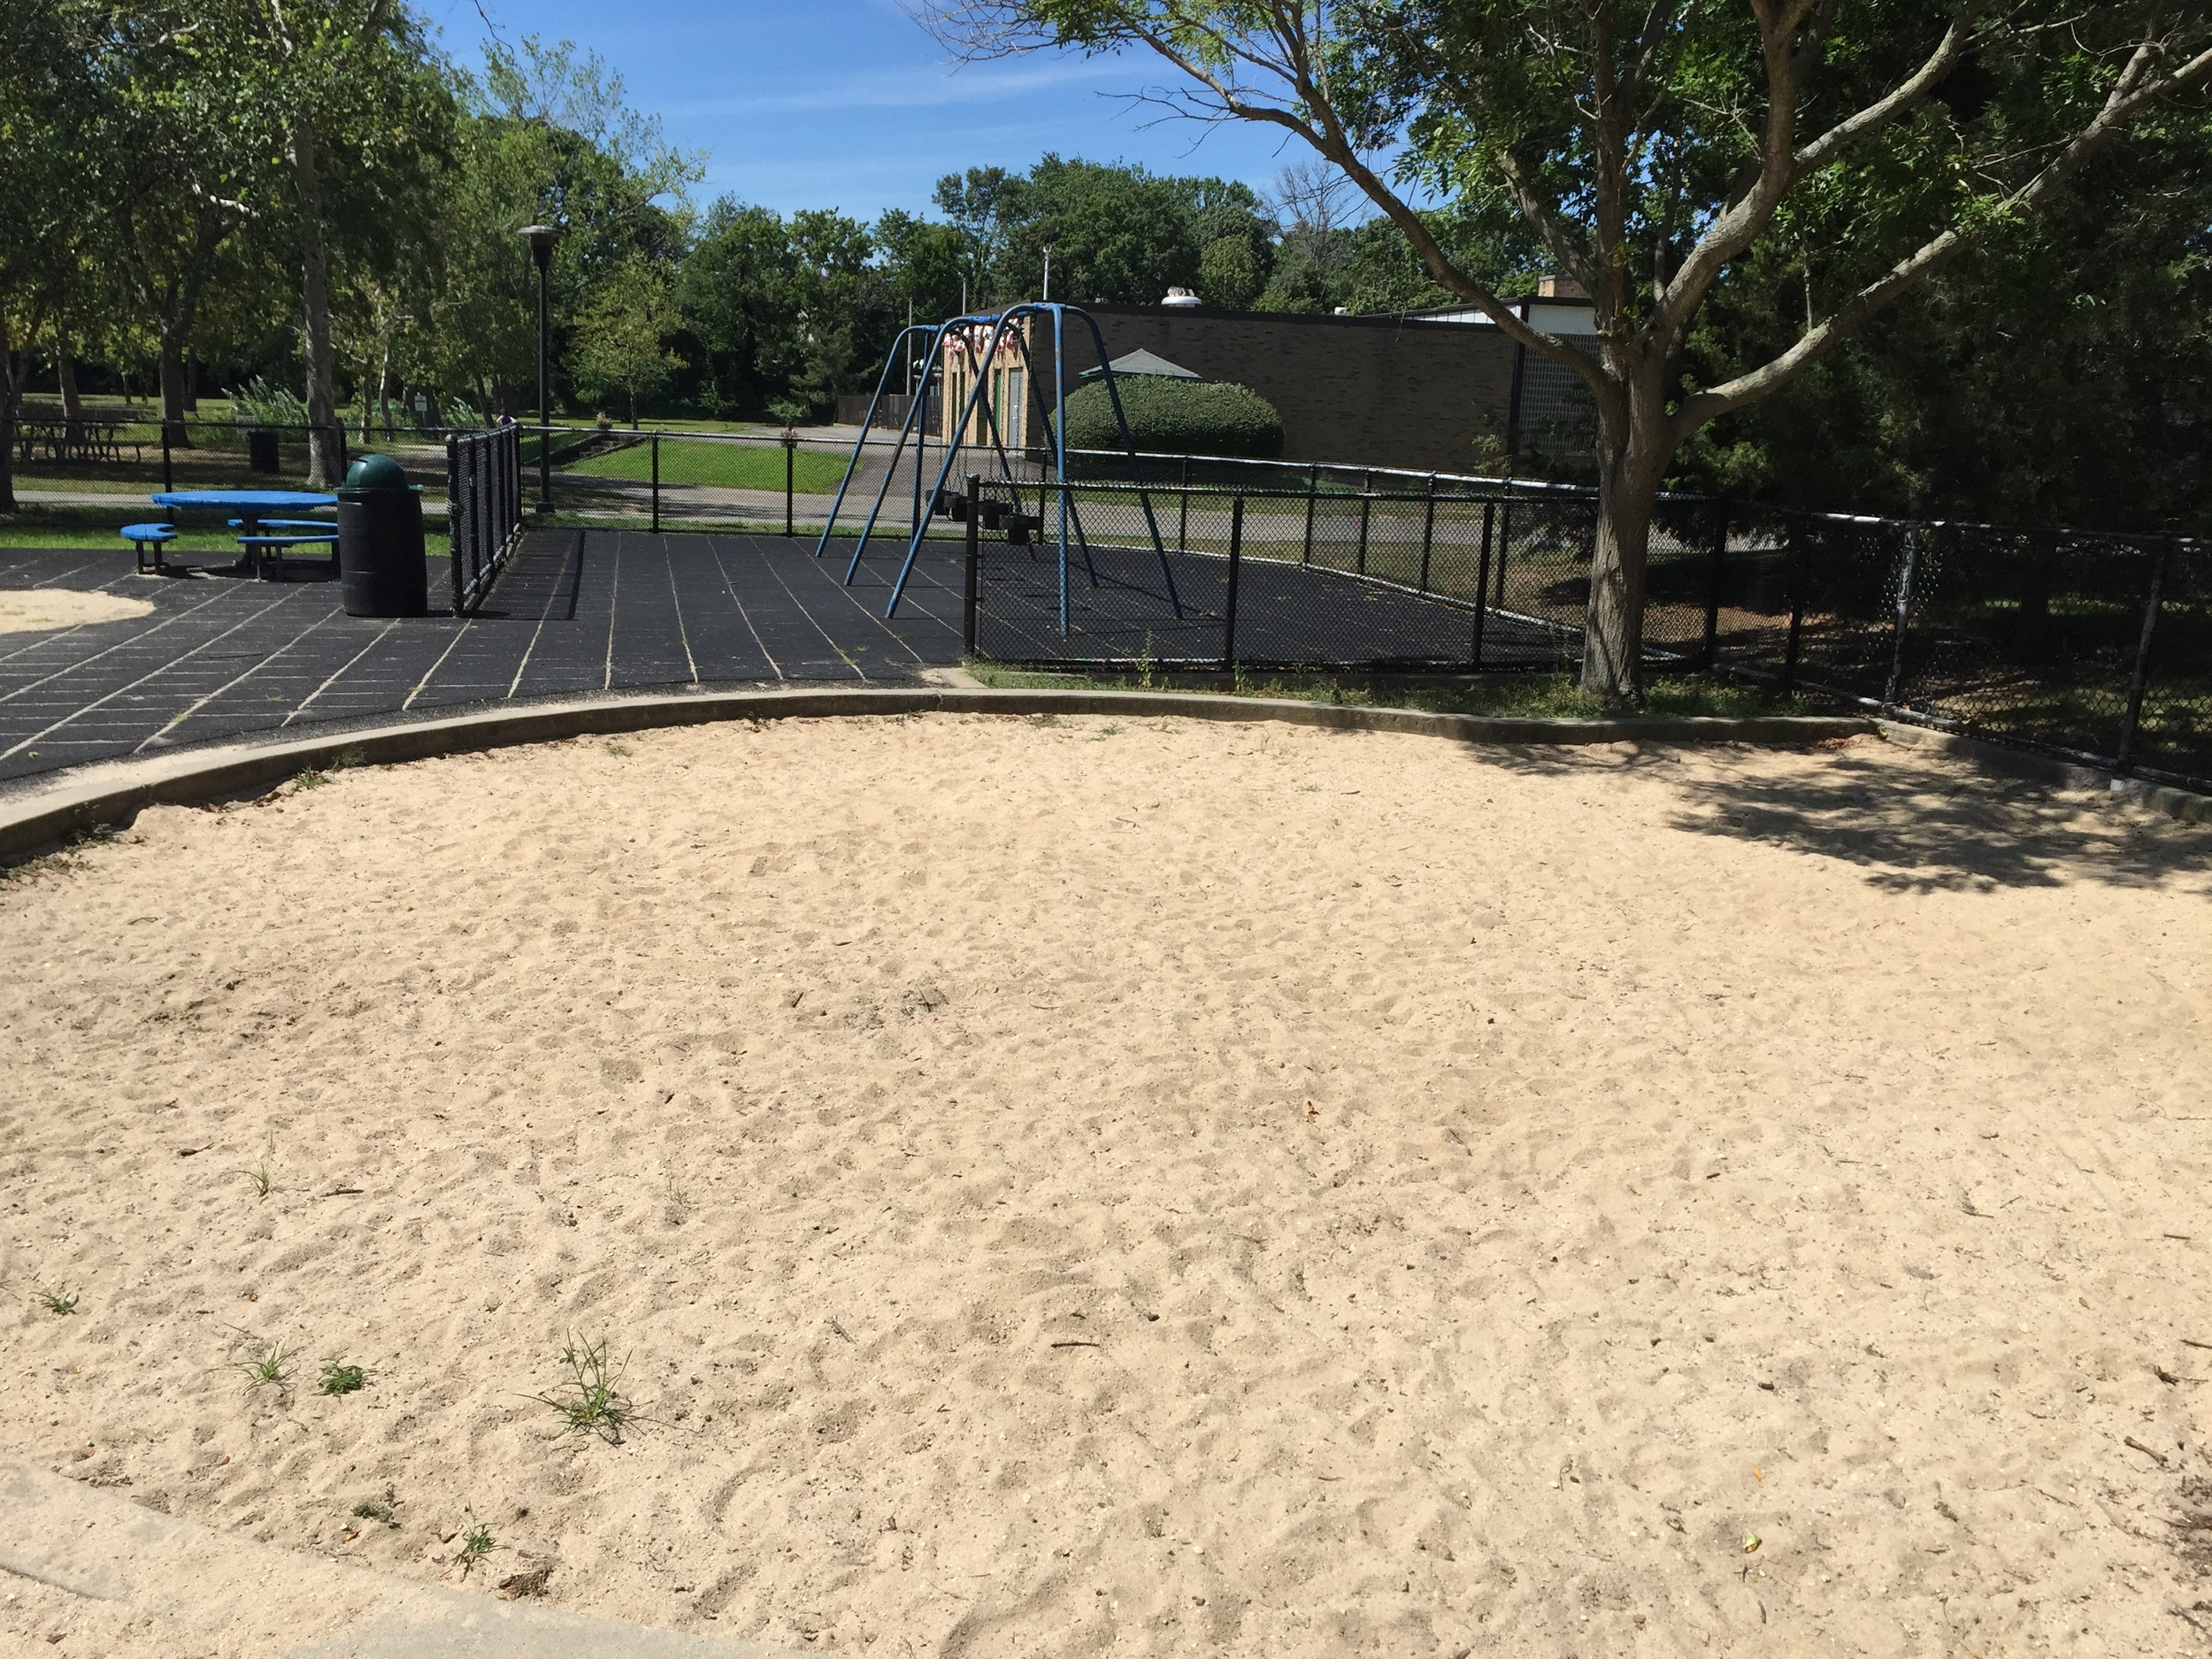 Sandbox at Grant Park